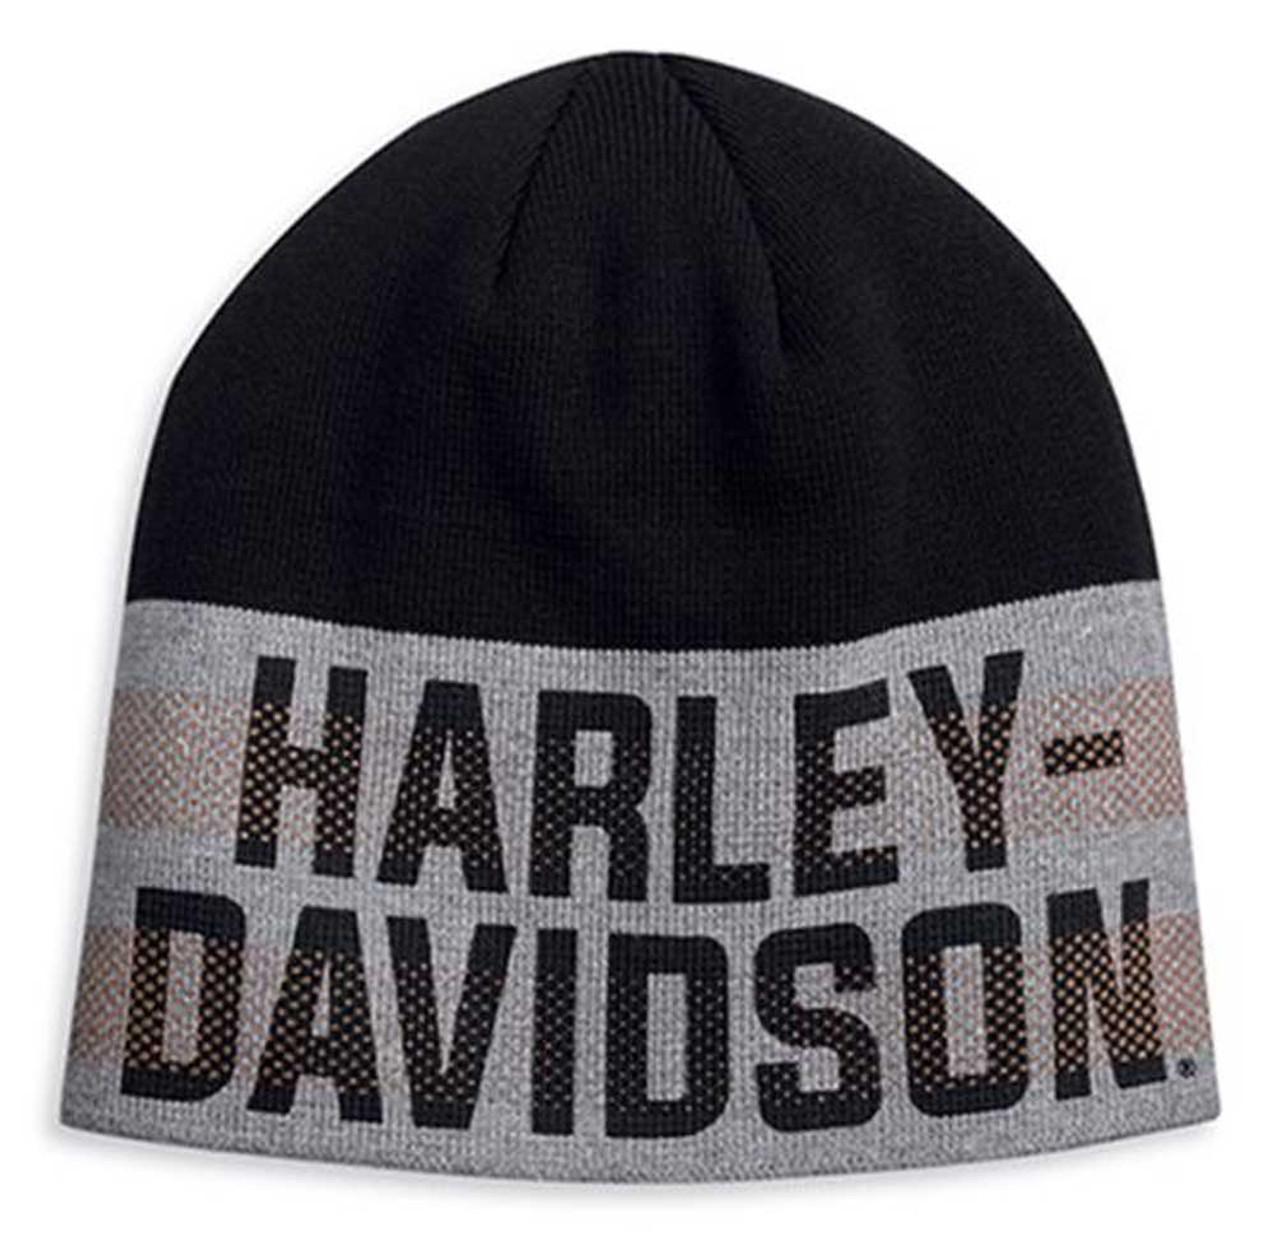 Harley-Davidson® Men/'s Retro Cuffed Bobble Pom Knit Hat 97611-20VM